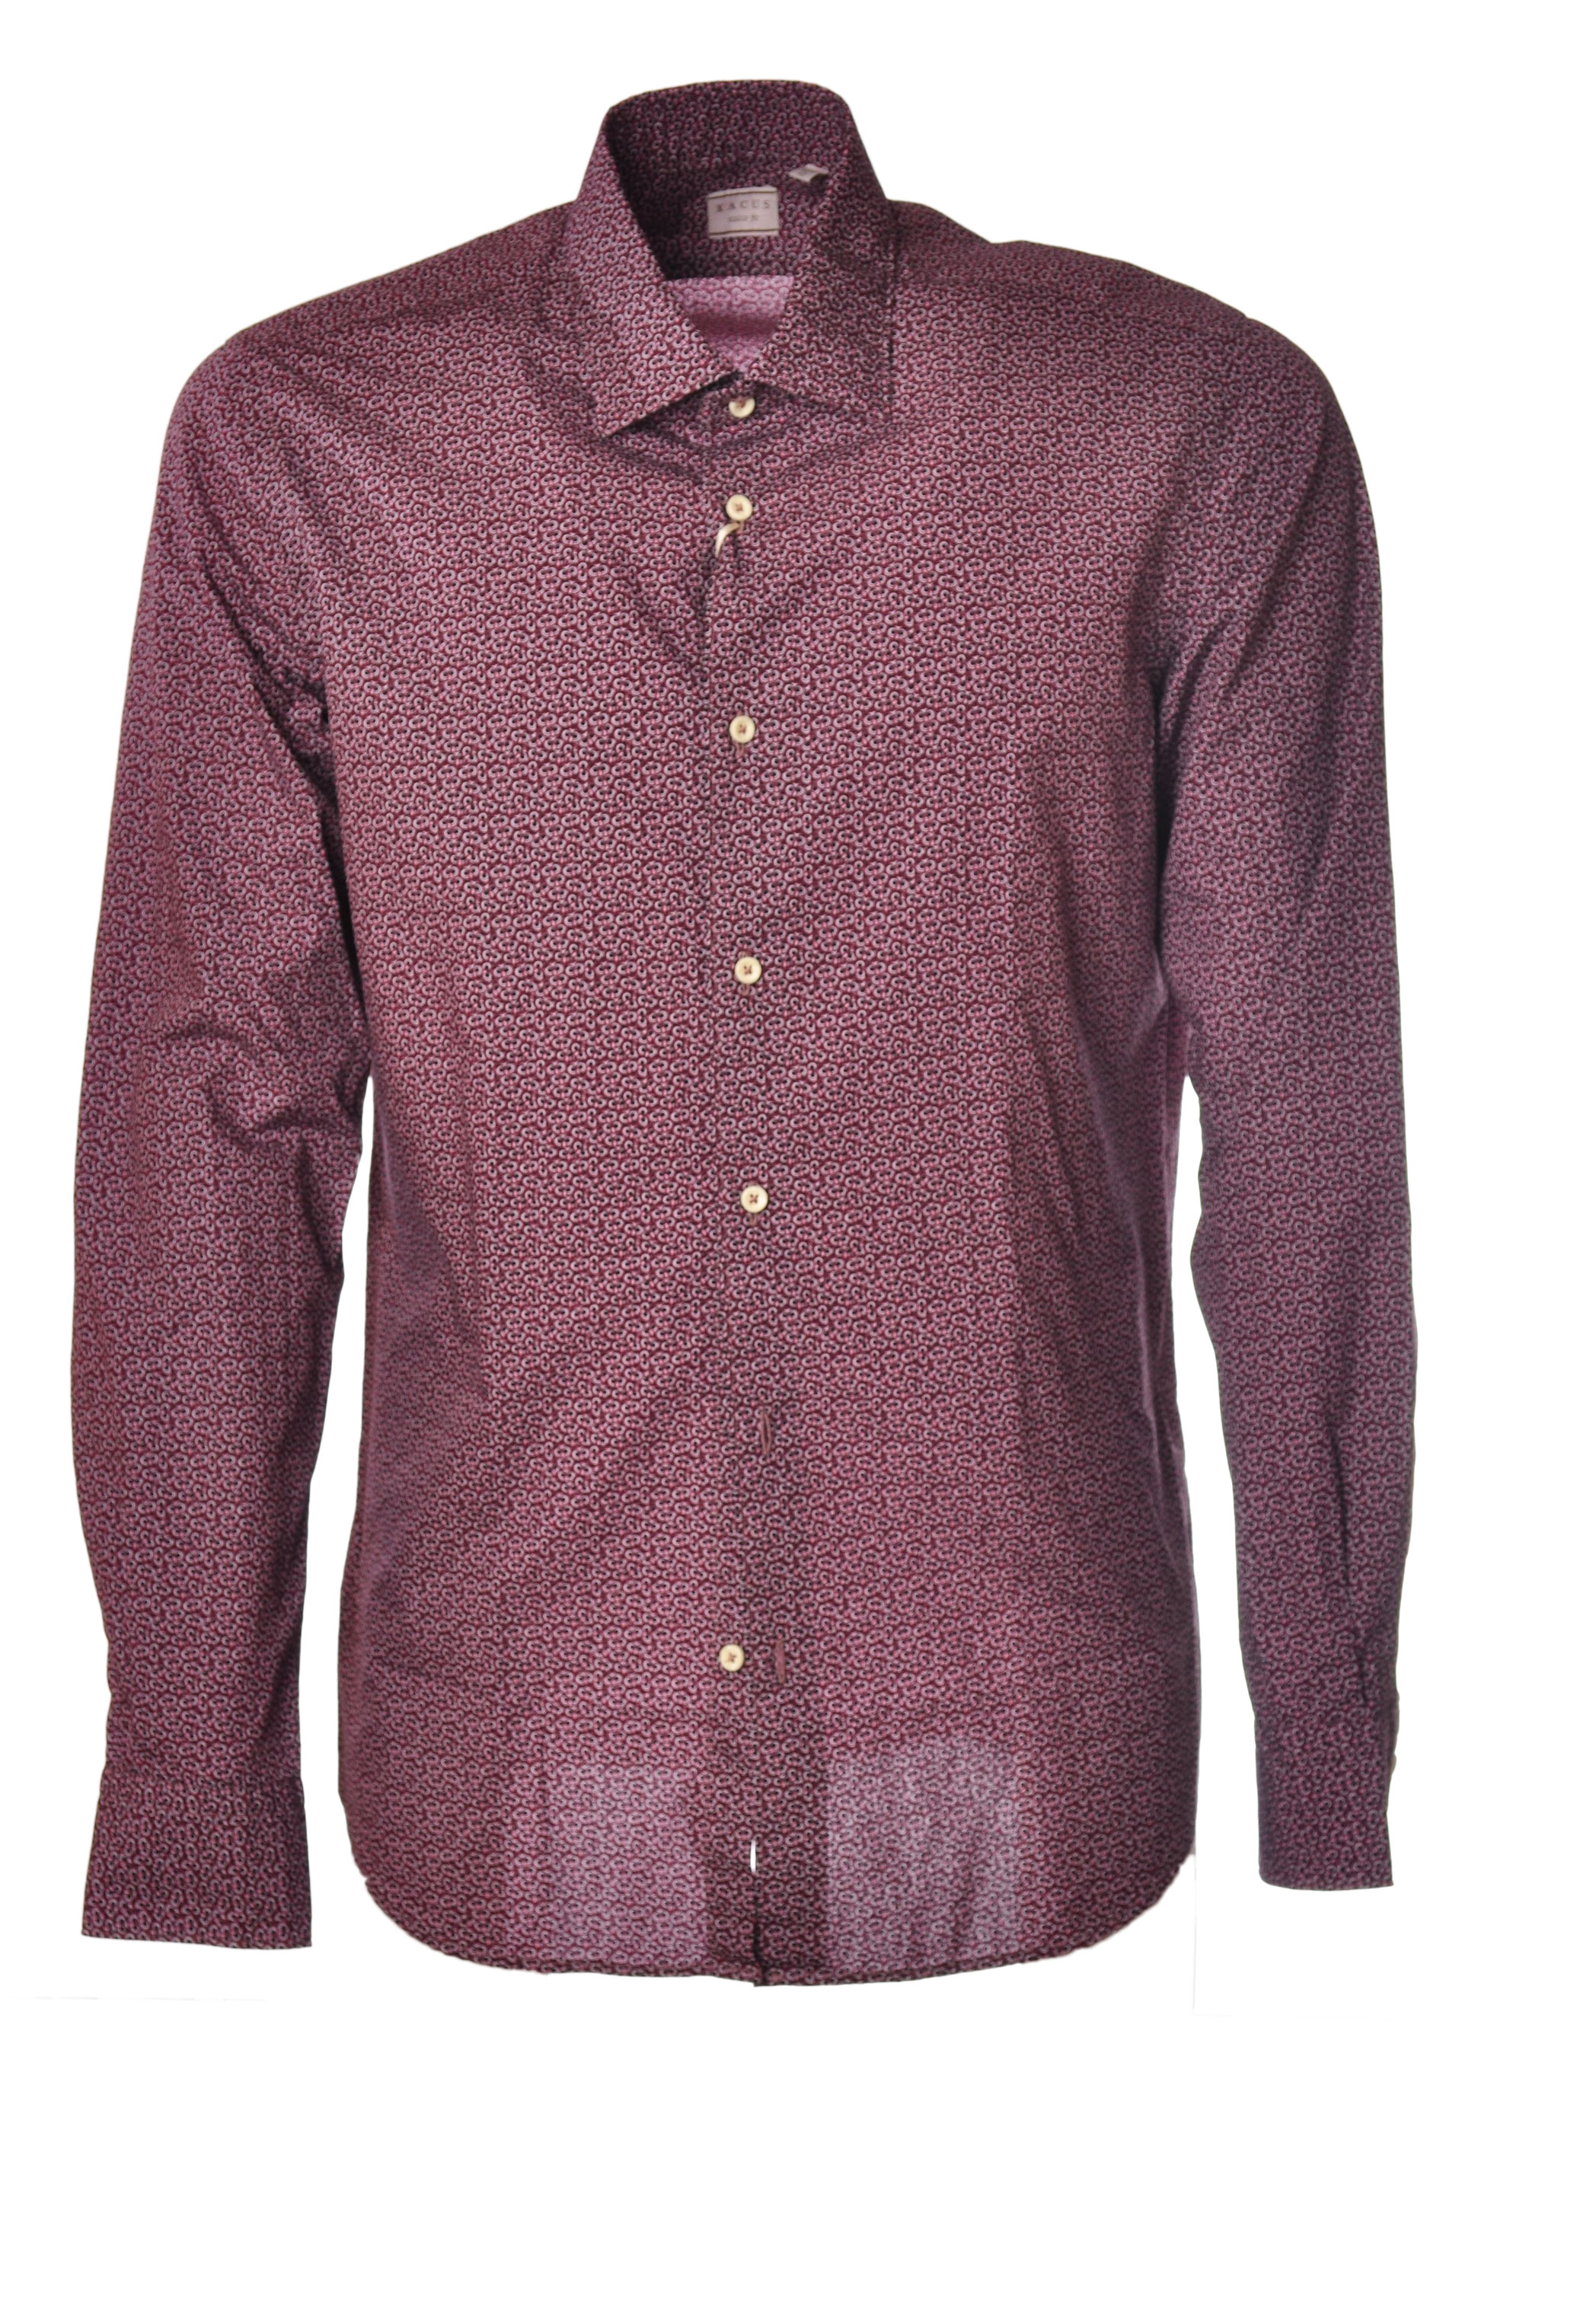 Xacus - Camicie